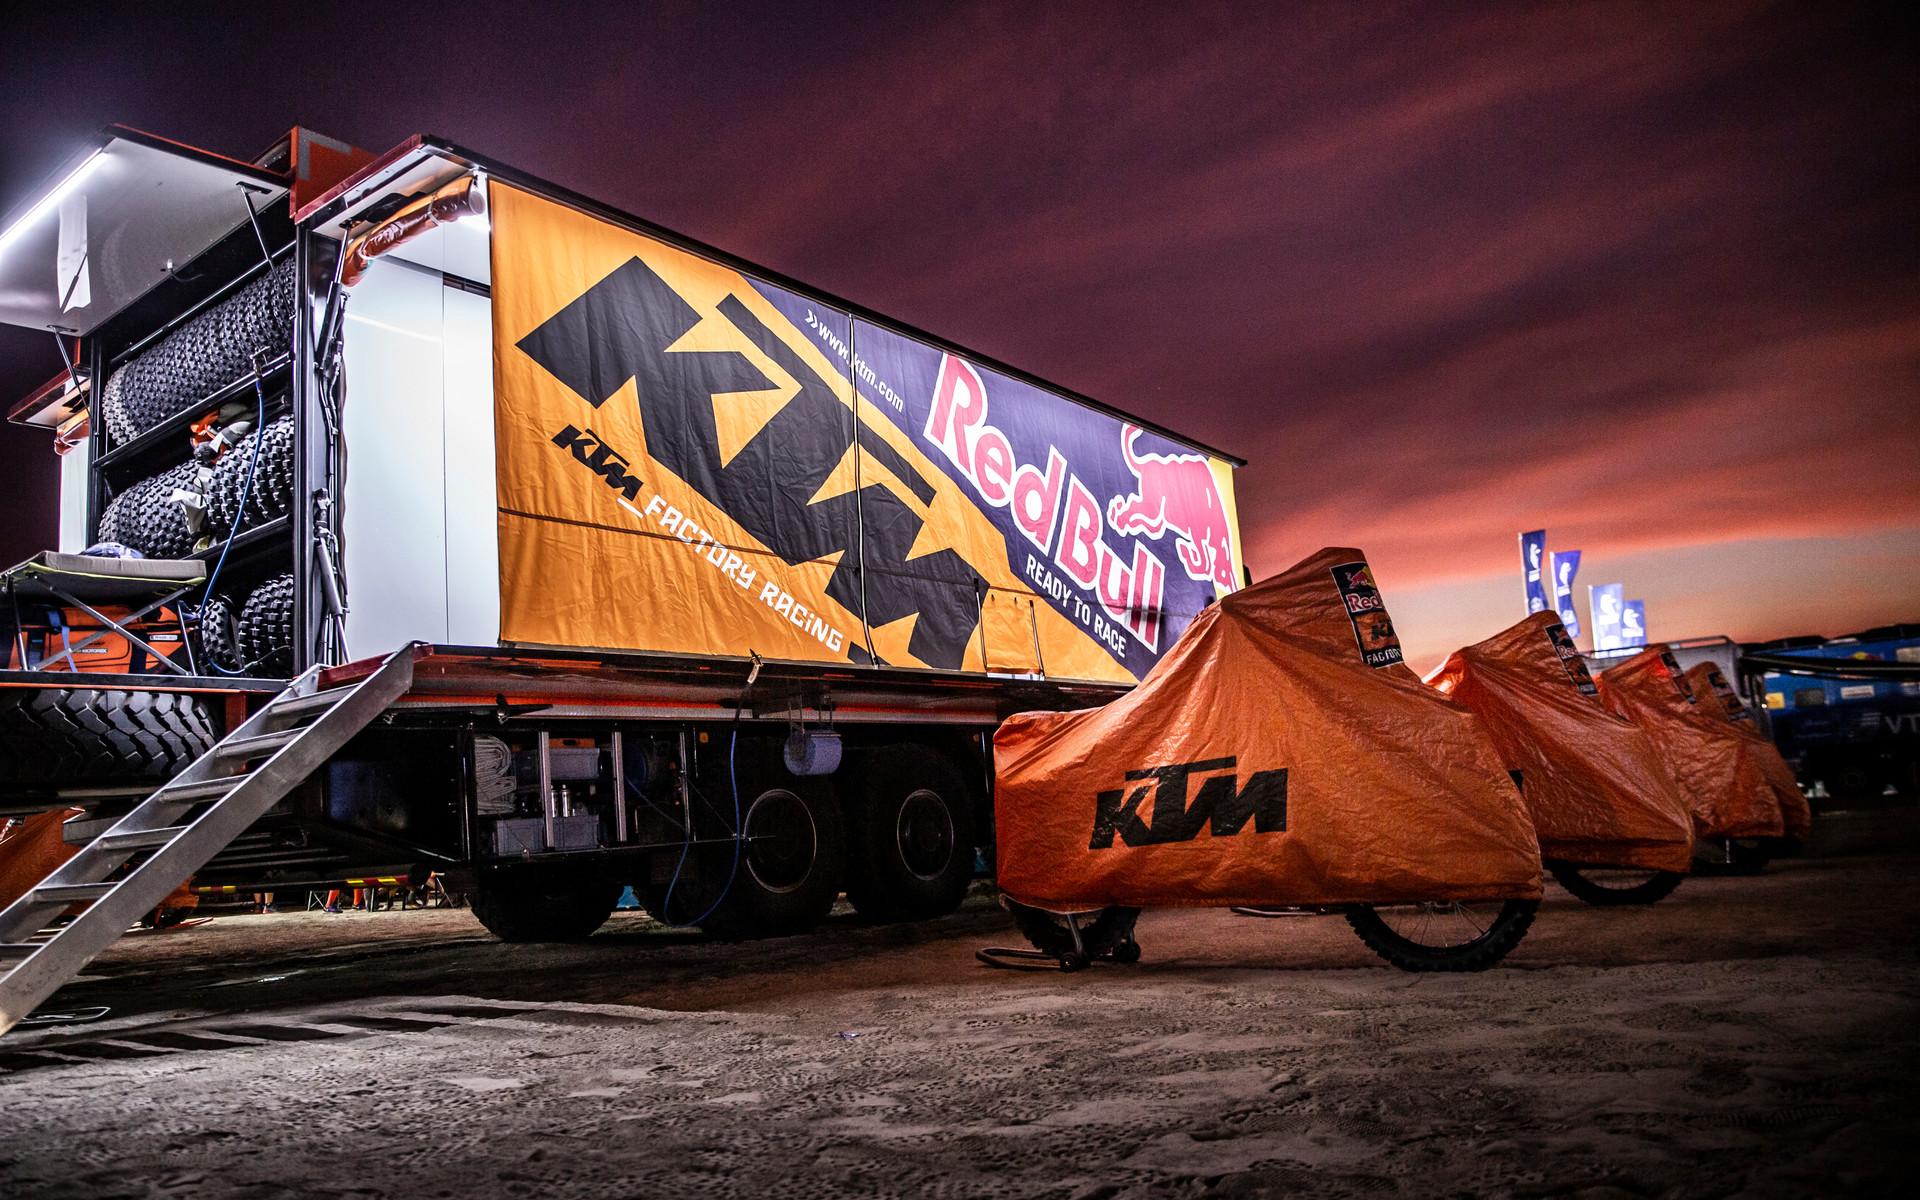 262241_misc_stage2_Red Bull KTM Factory Racing_Dakar2019_148.jpg